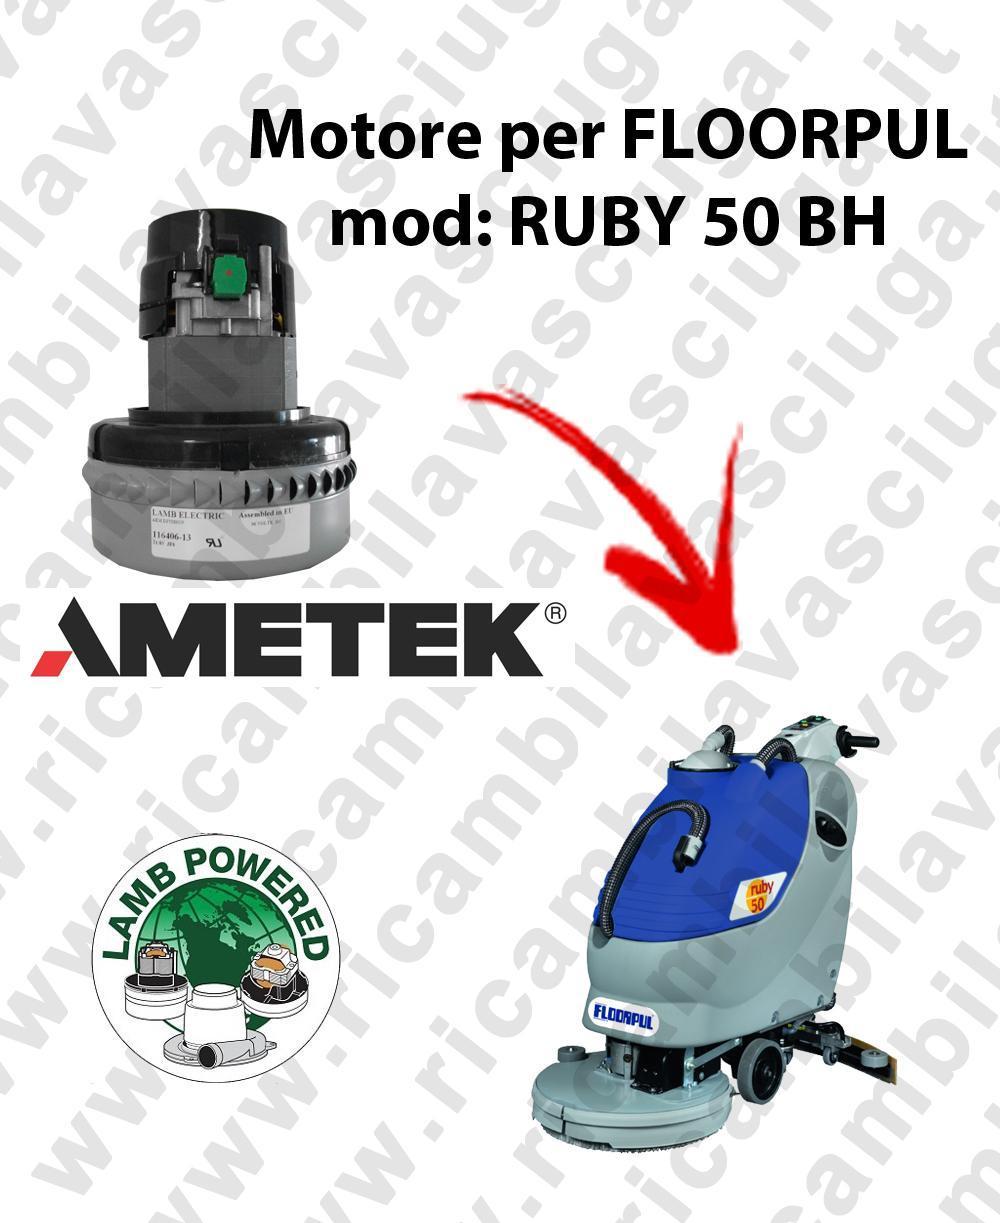 RUBY 50 BH LAMB AMETEK vacuum motor for scrubber dryer FLOORPUL